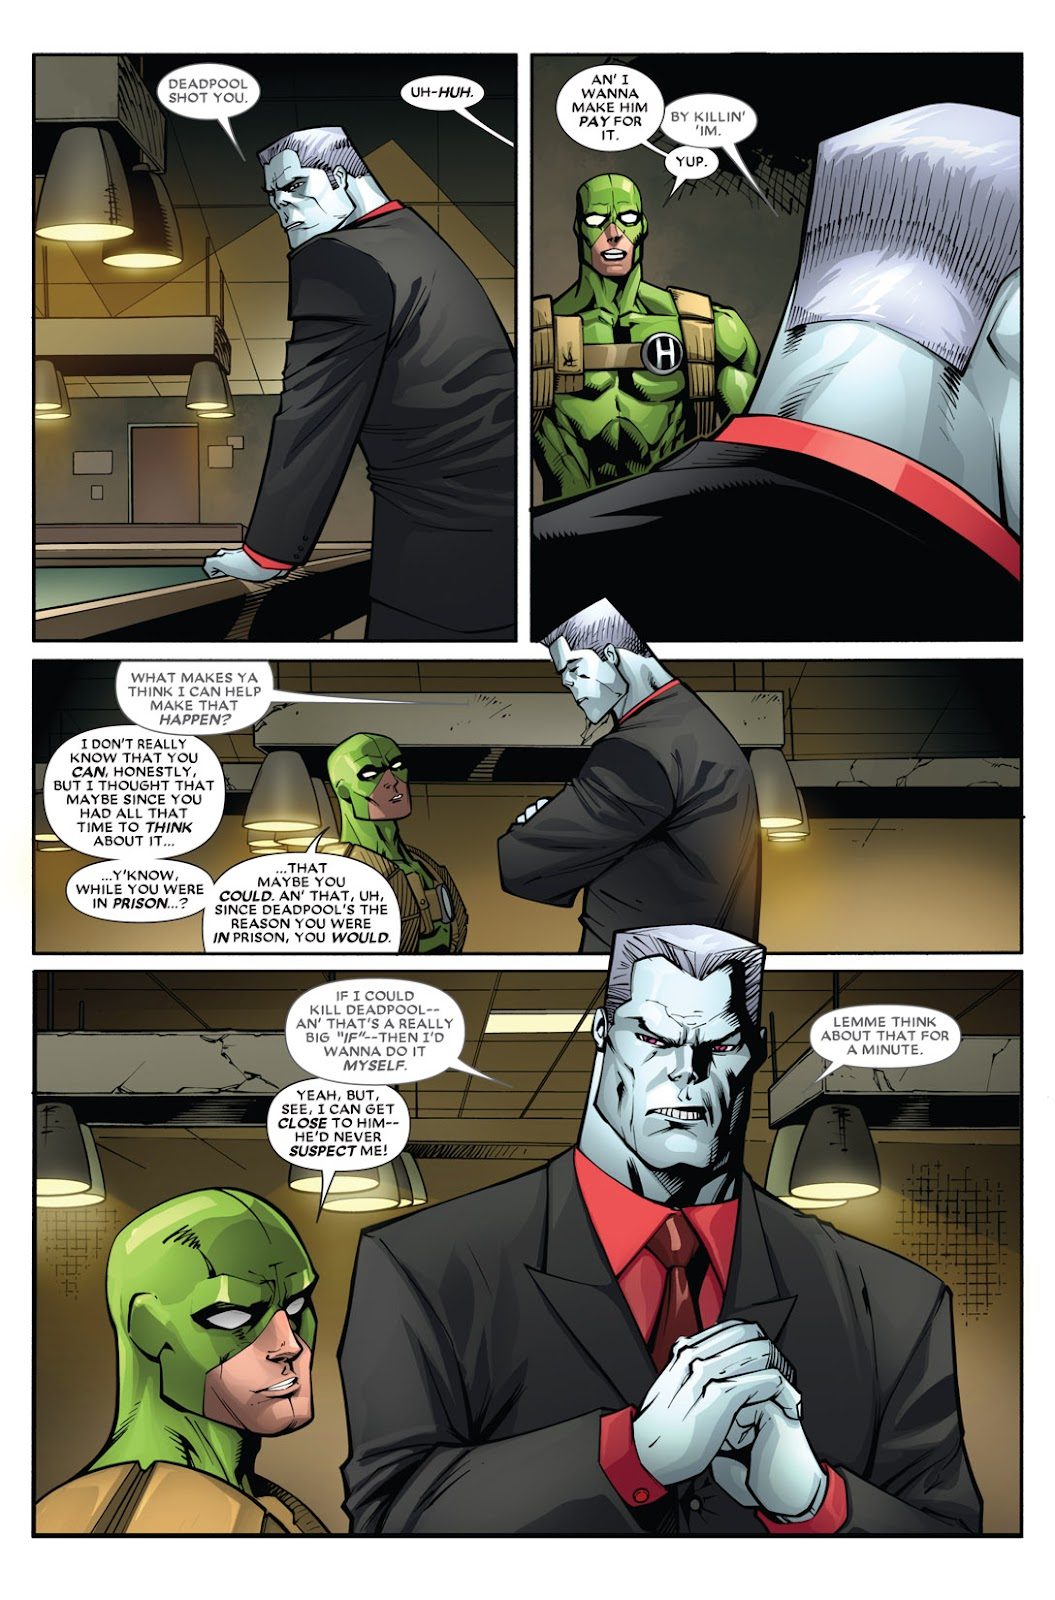 Read online Deadpool (2008) comic -  Issue #51 - 16